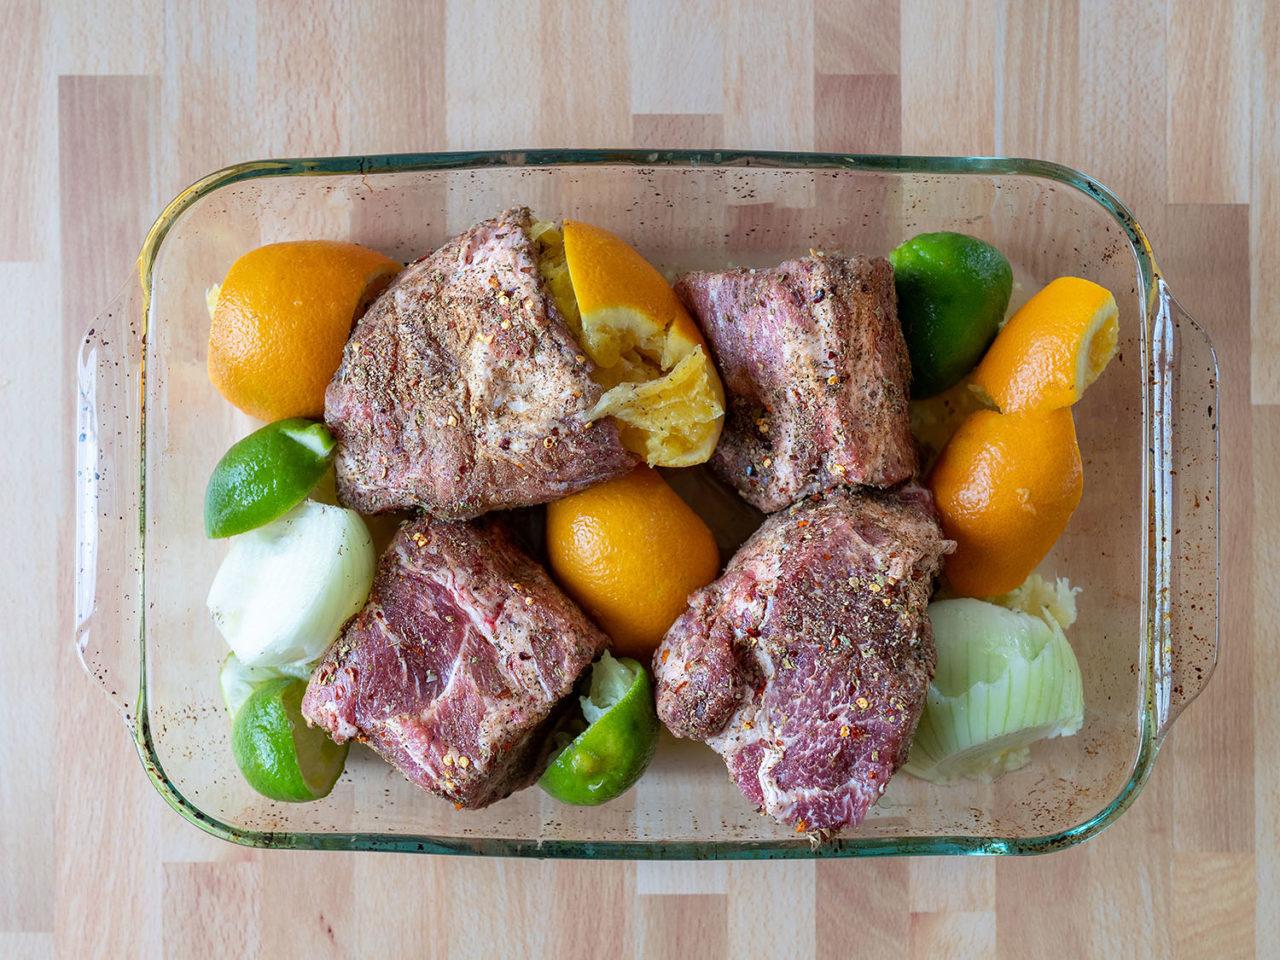 Carinitas recipe - ready for the oven